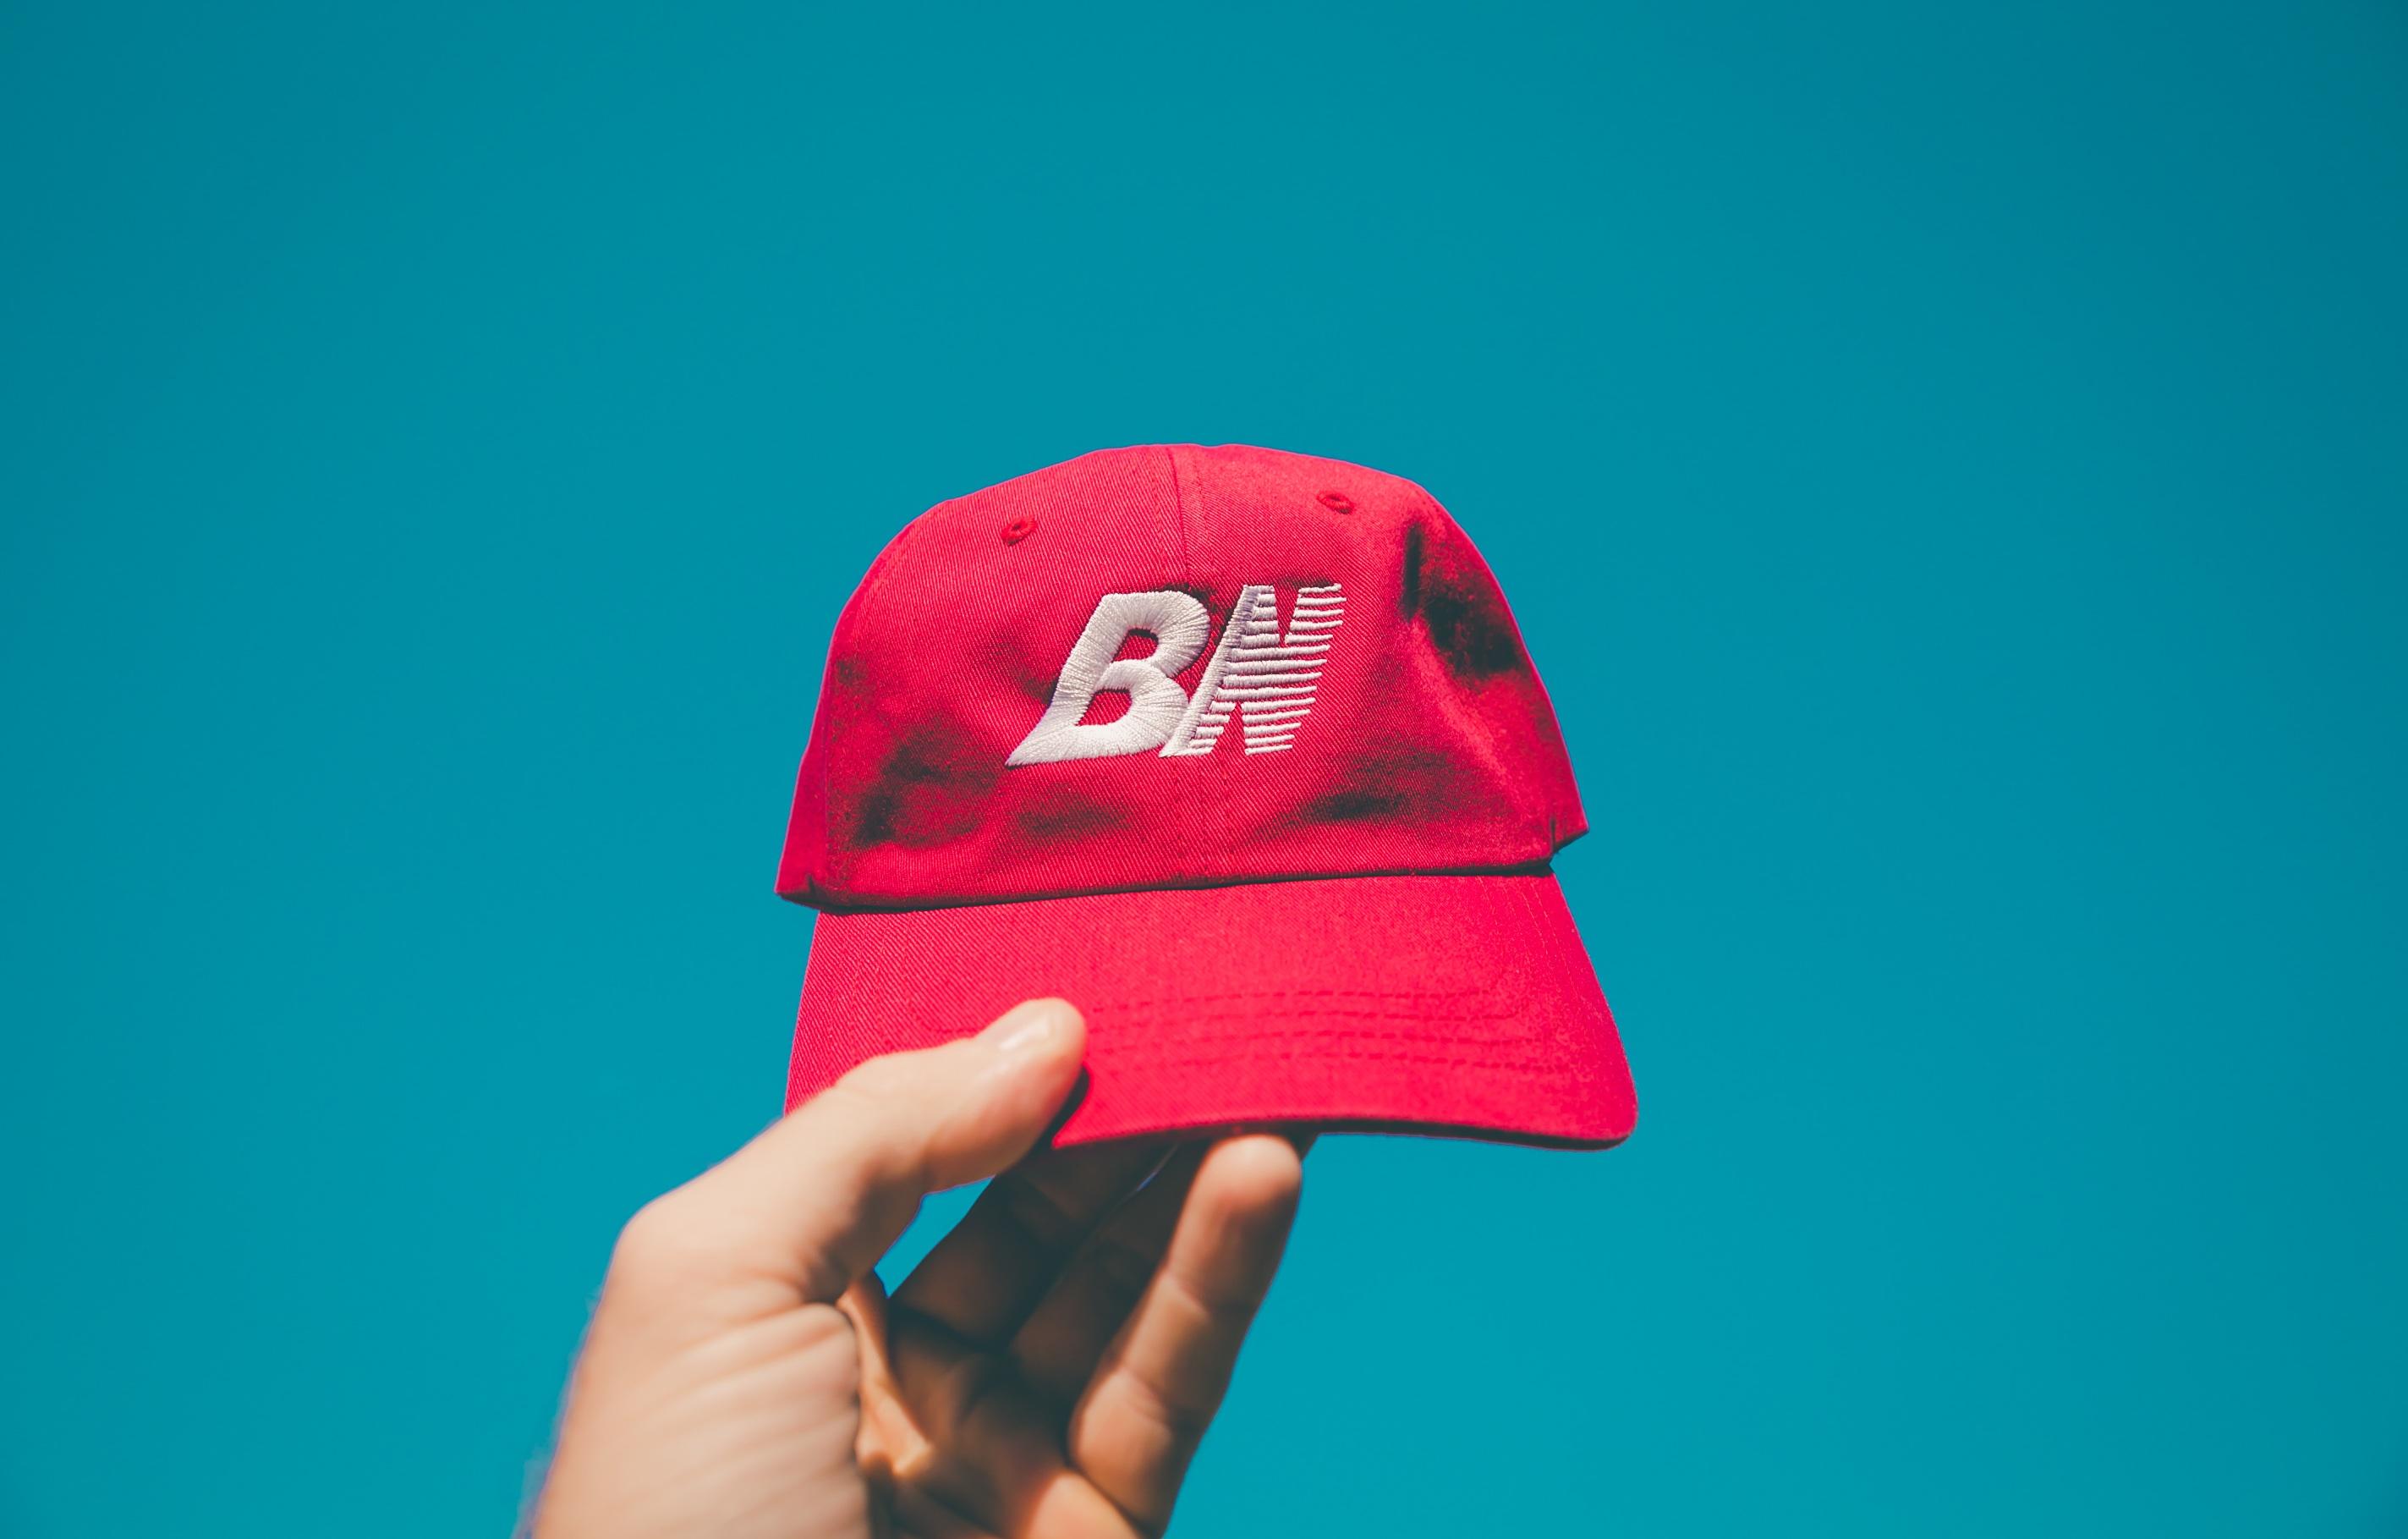 tangan merah warna bendera topi pakaian berwarna merah muda penutup kepala topi